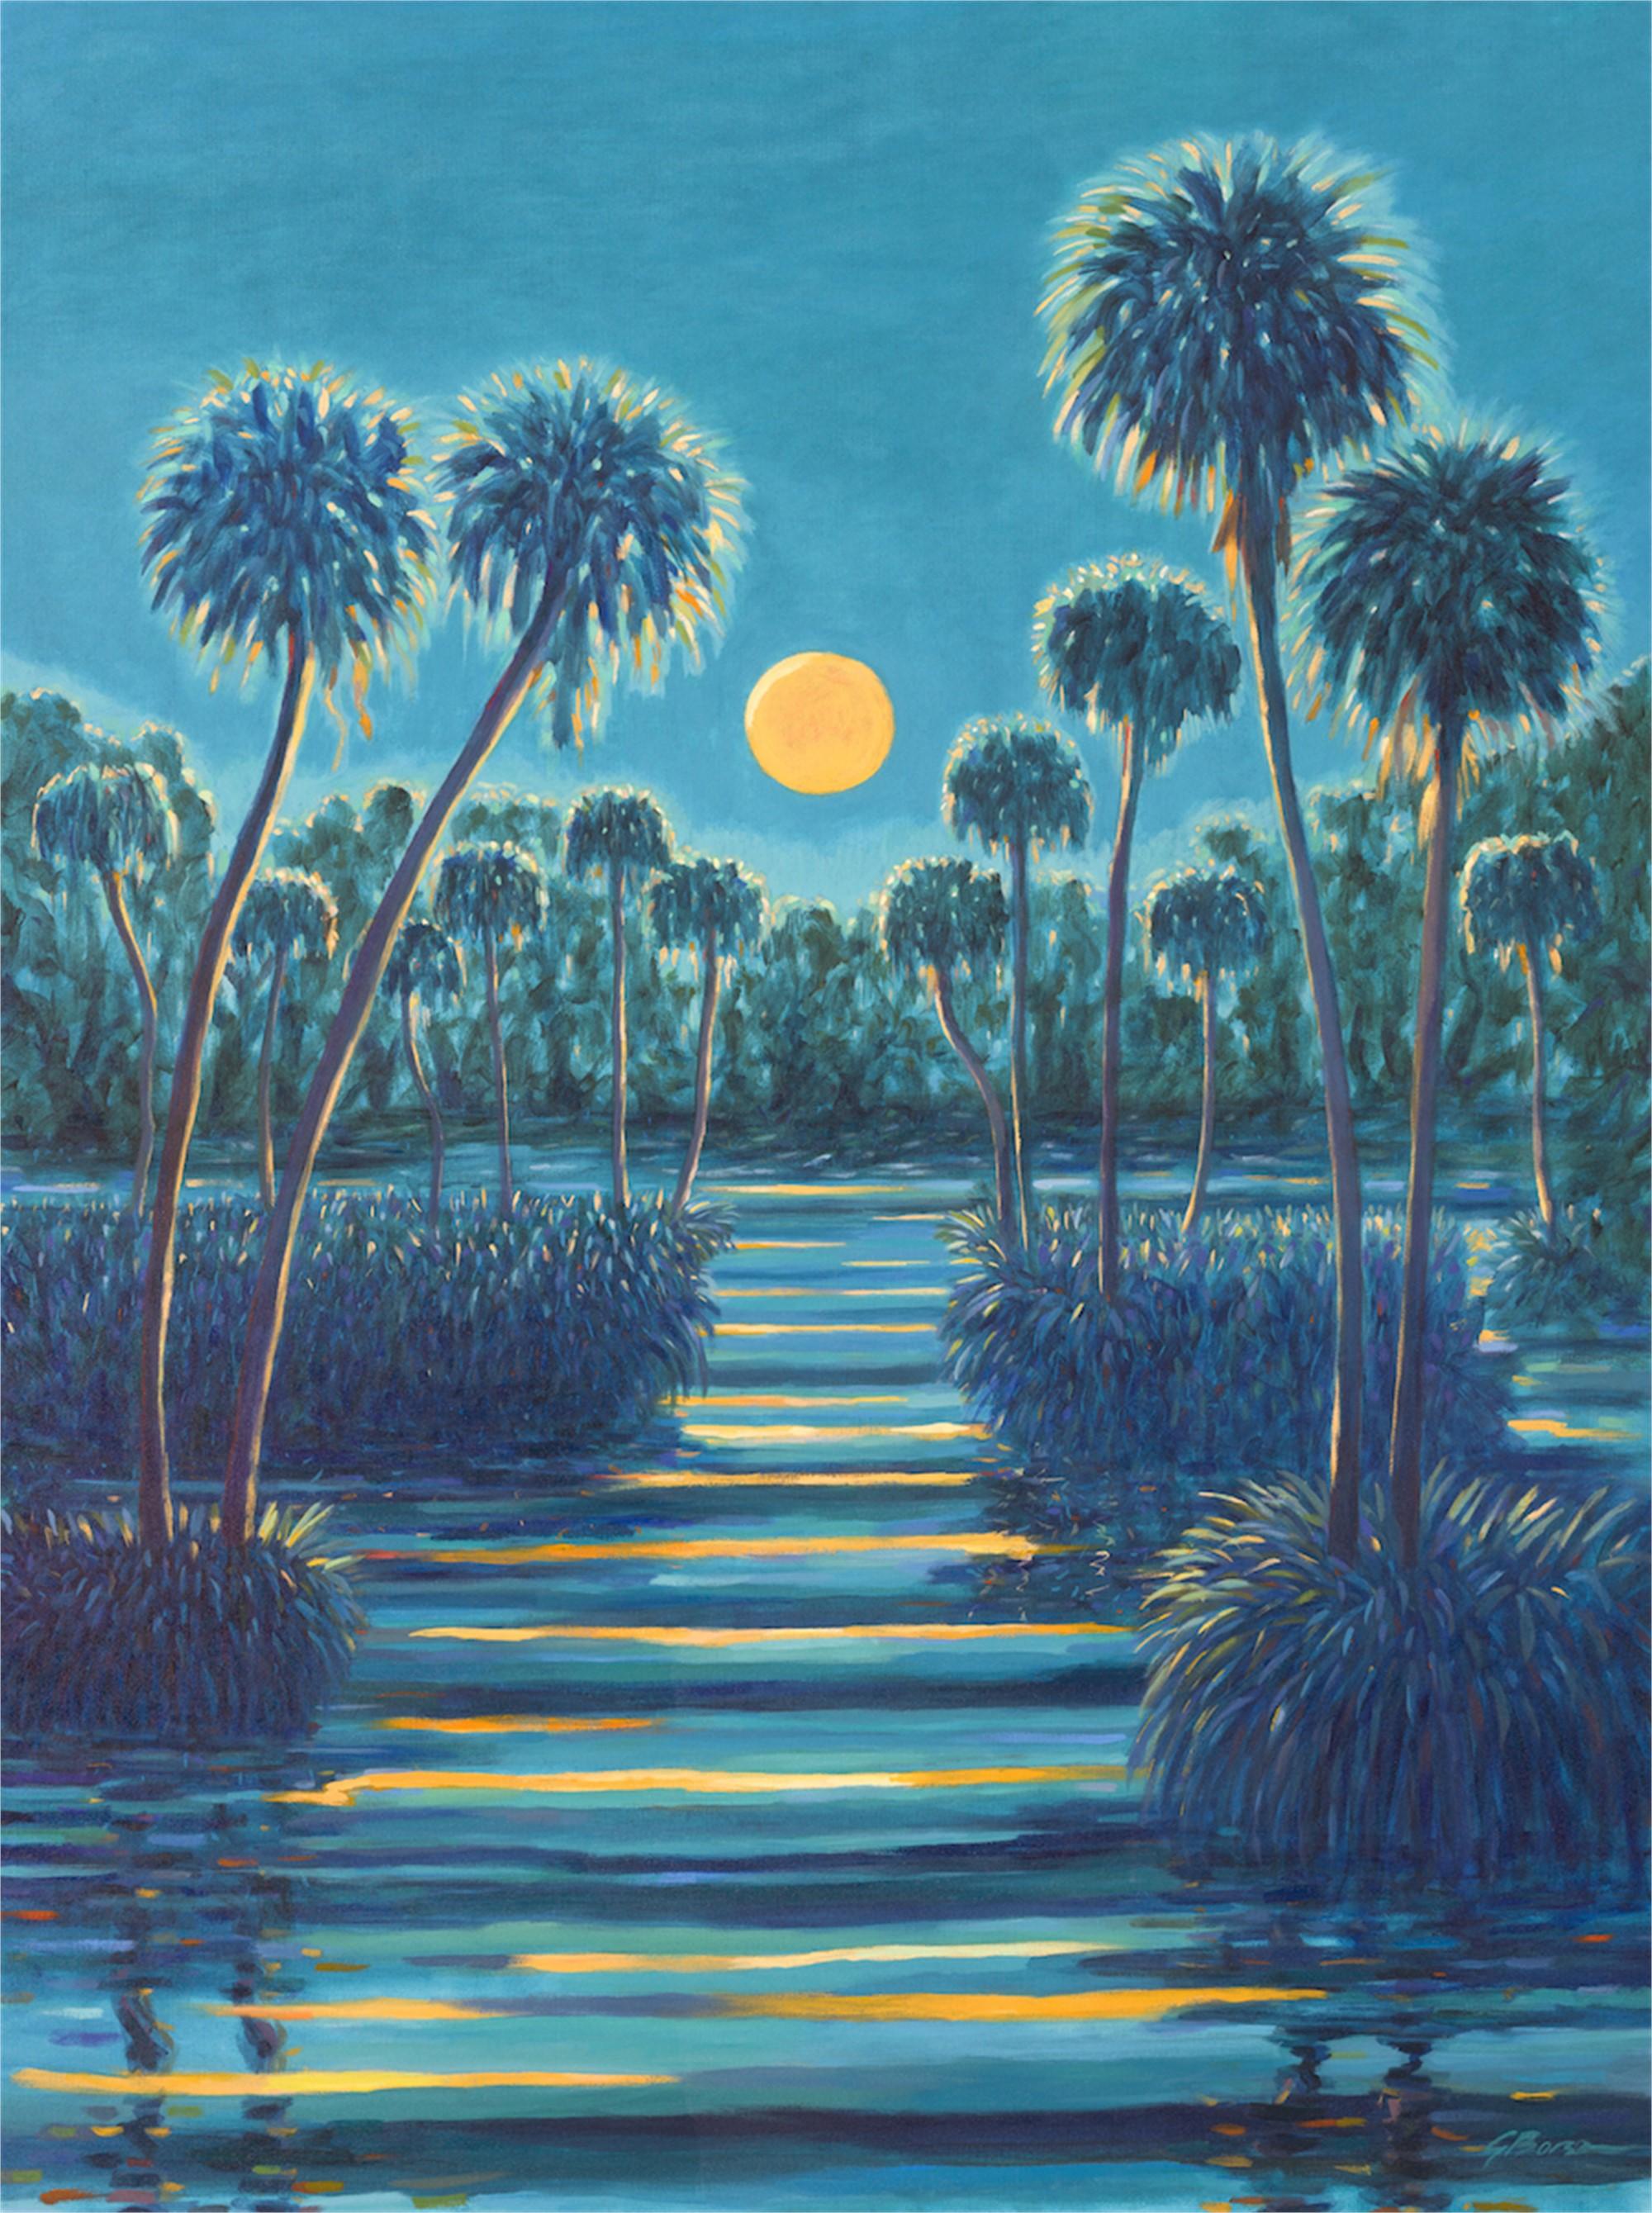 Moonlight Romance by Gary Borse